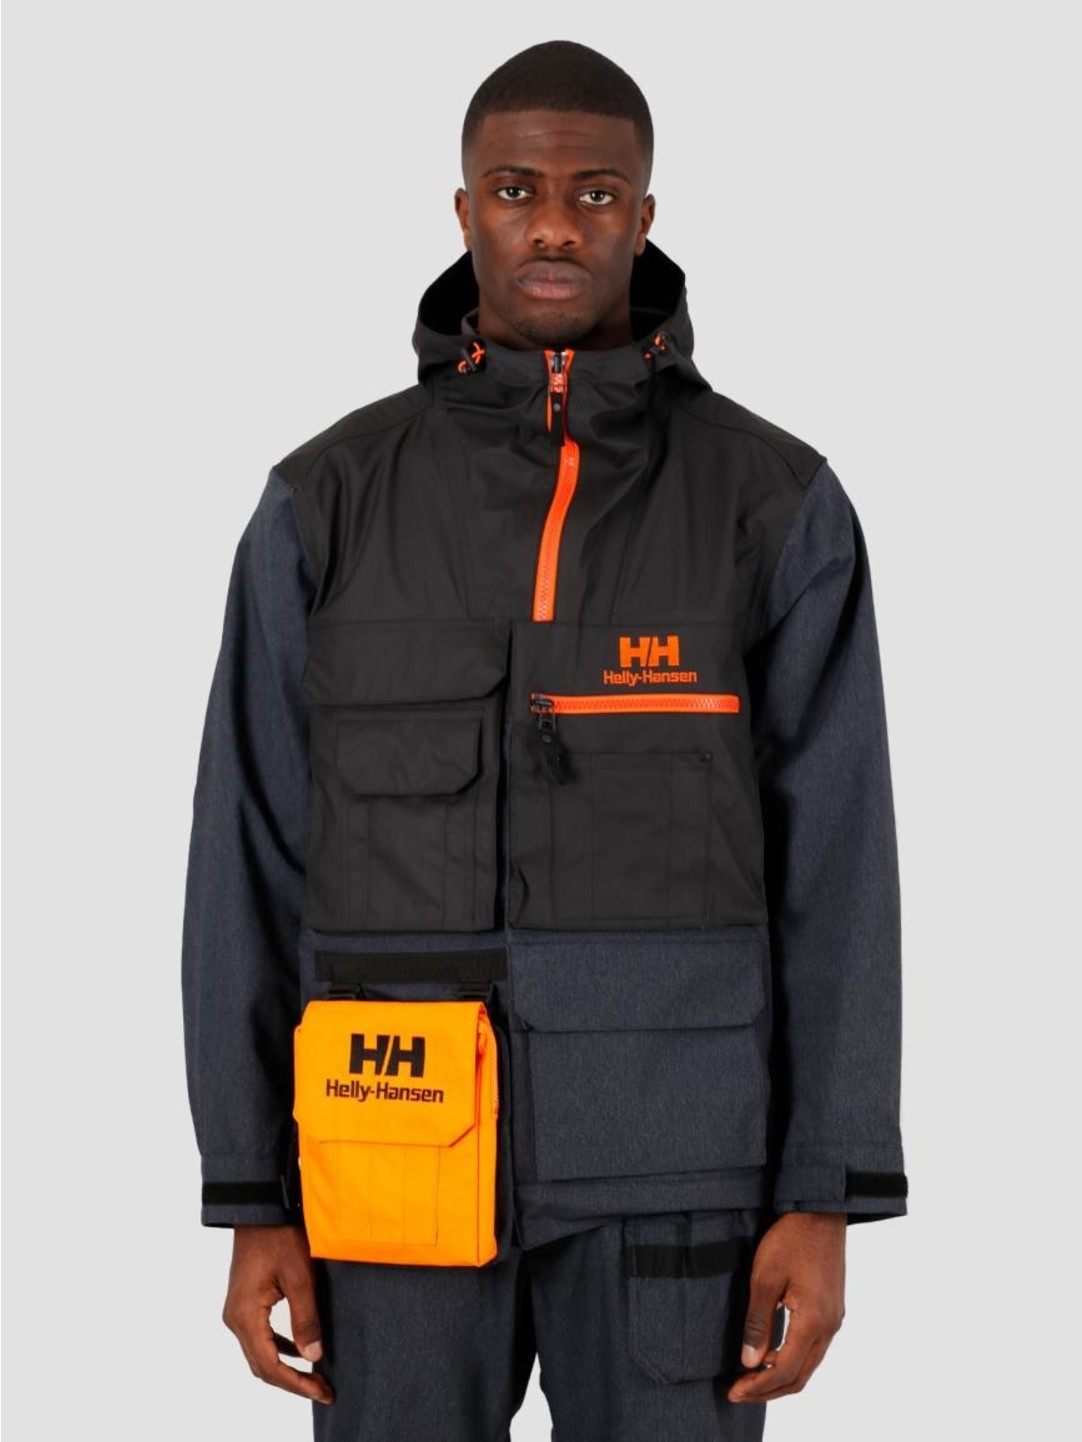 Helly Hansen Helly Hansen Heritage PU Hybrid Rain Jacket Navy 53470-597